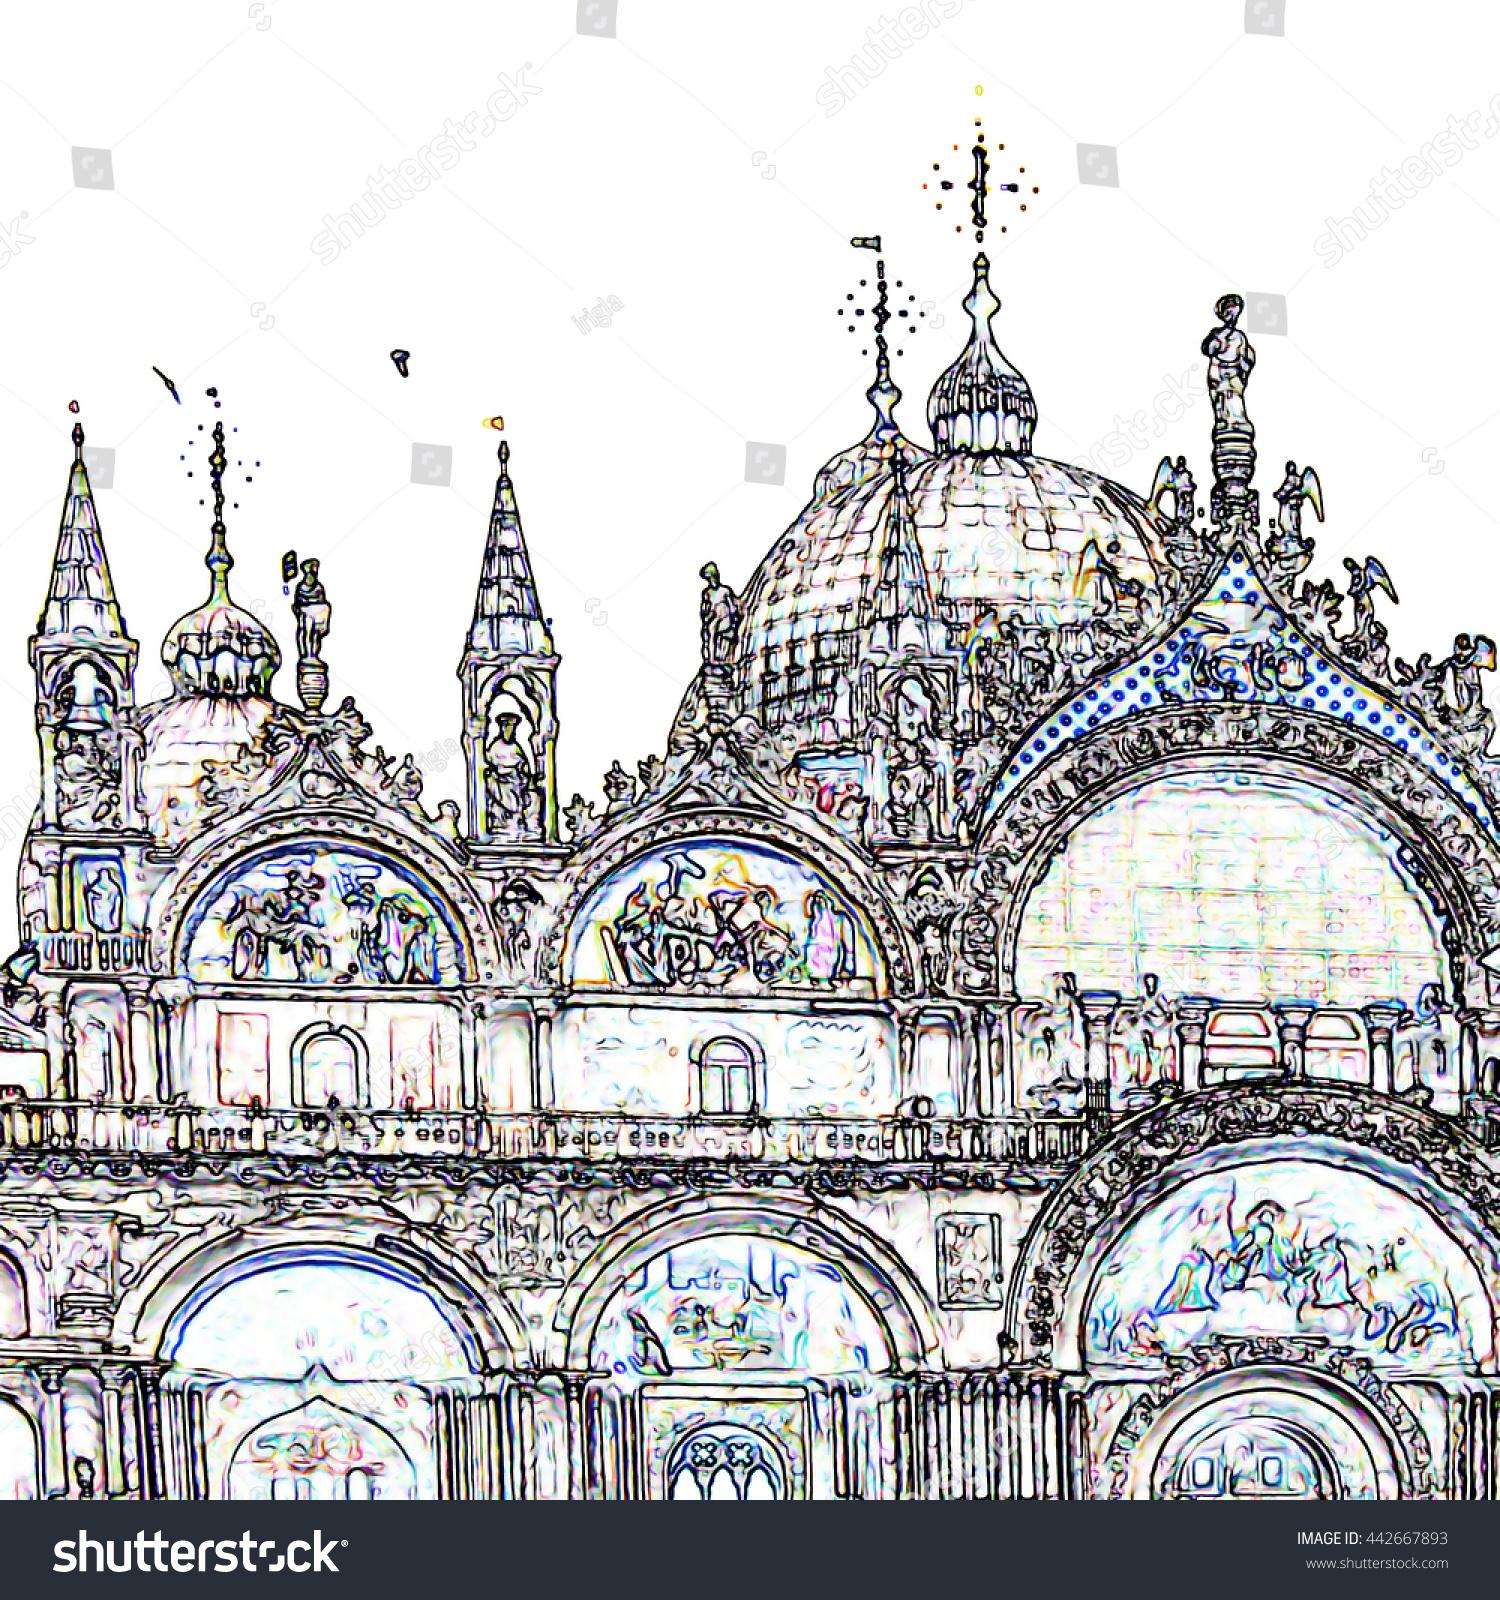 Veneto Basilica San Marco Stock Illustration 442667893 - Shutterstock